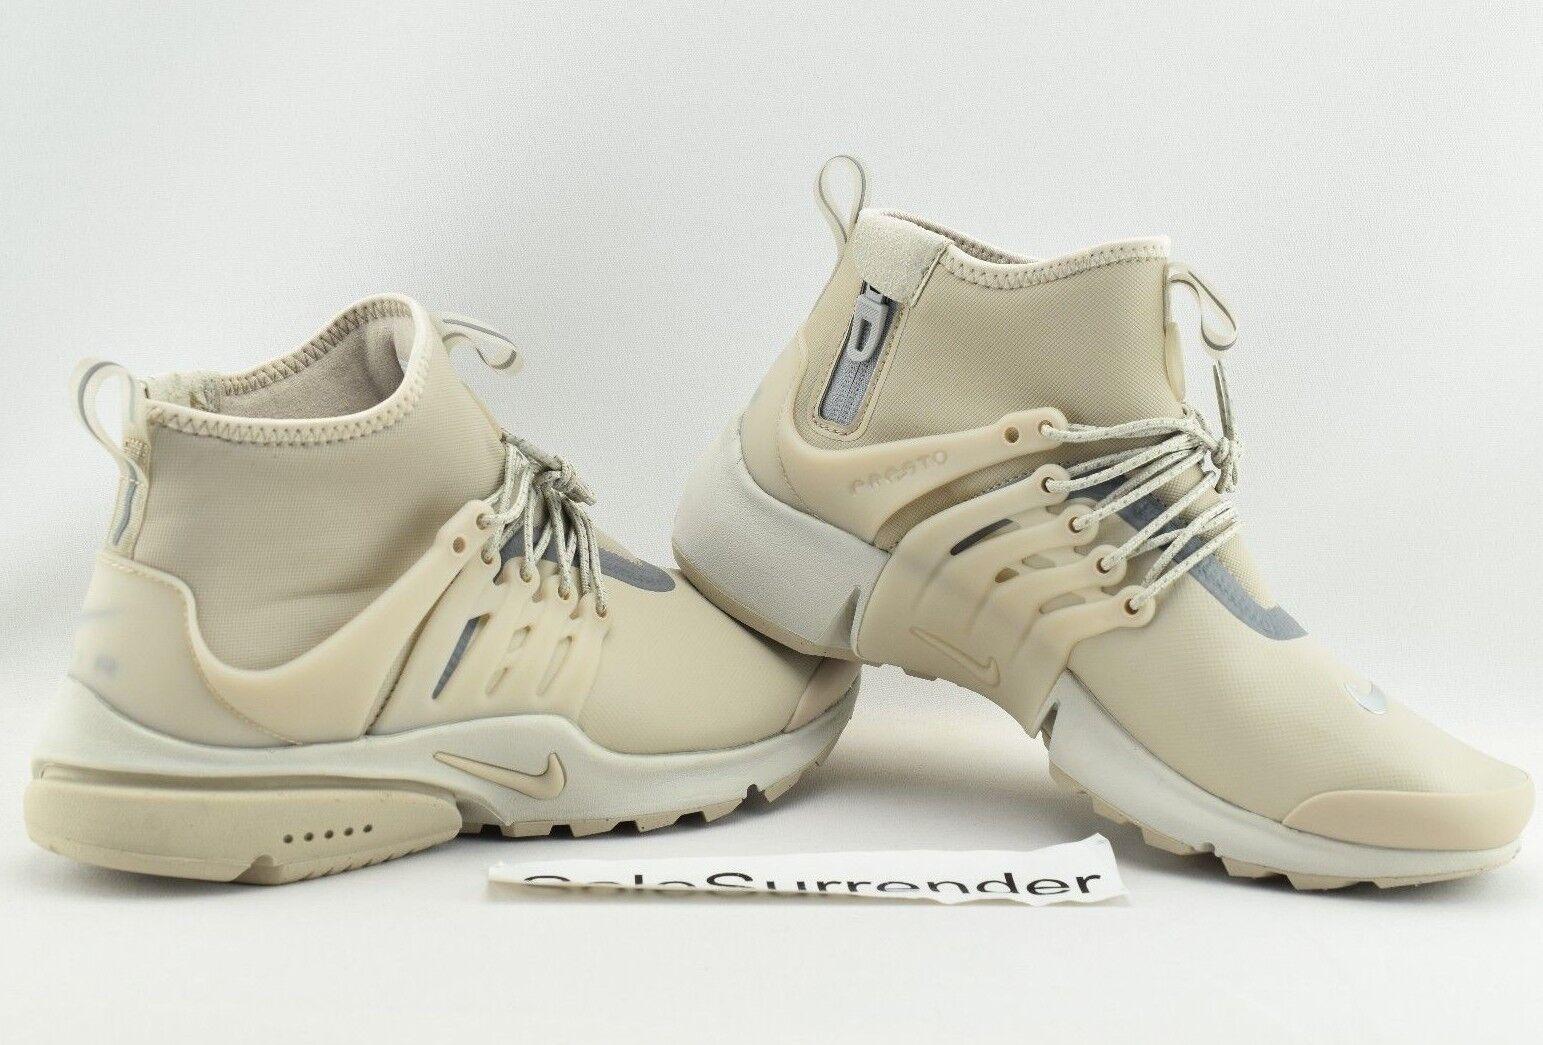 Women's Nike Air Presto Mid Utility - SIZE 10 - 859527-200 Beige String Hi Tan